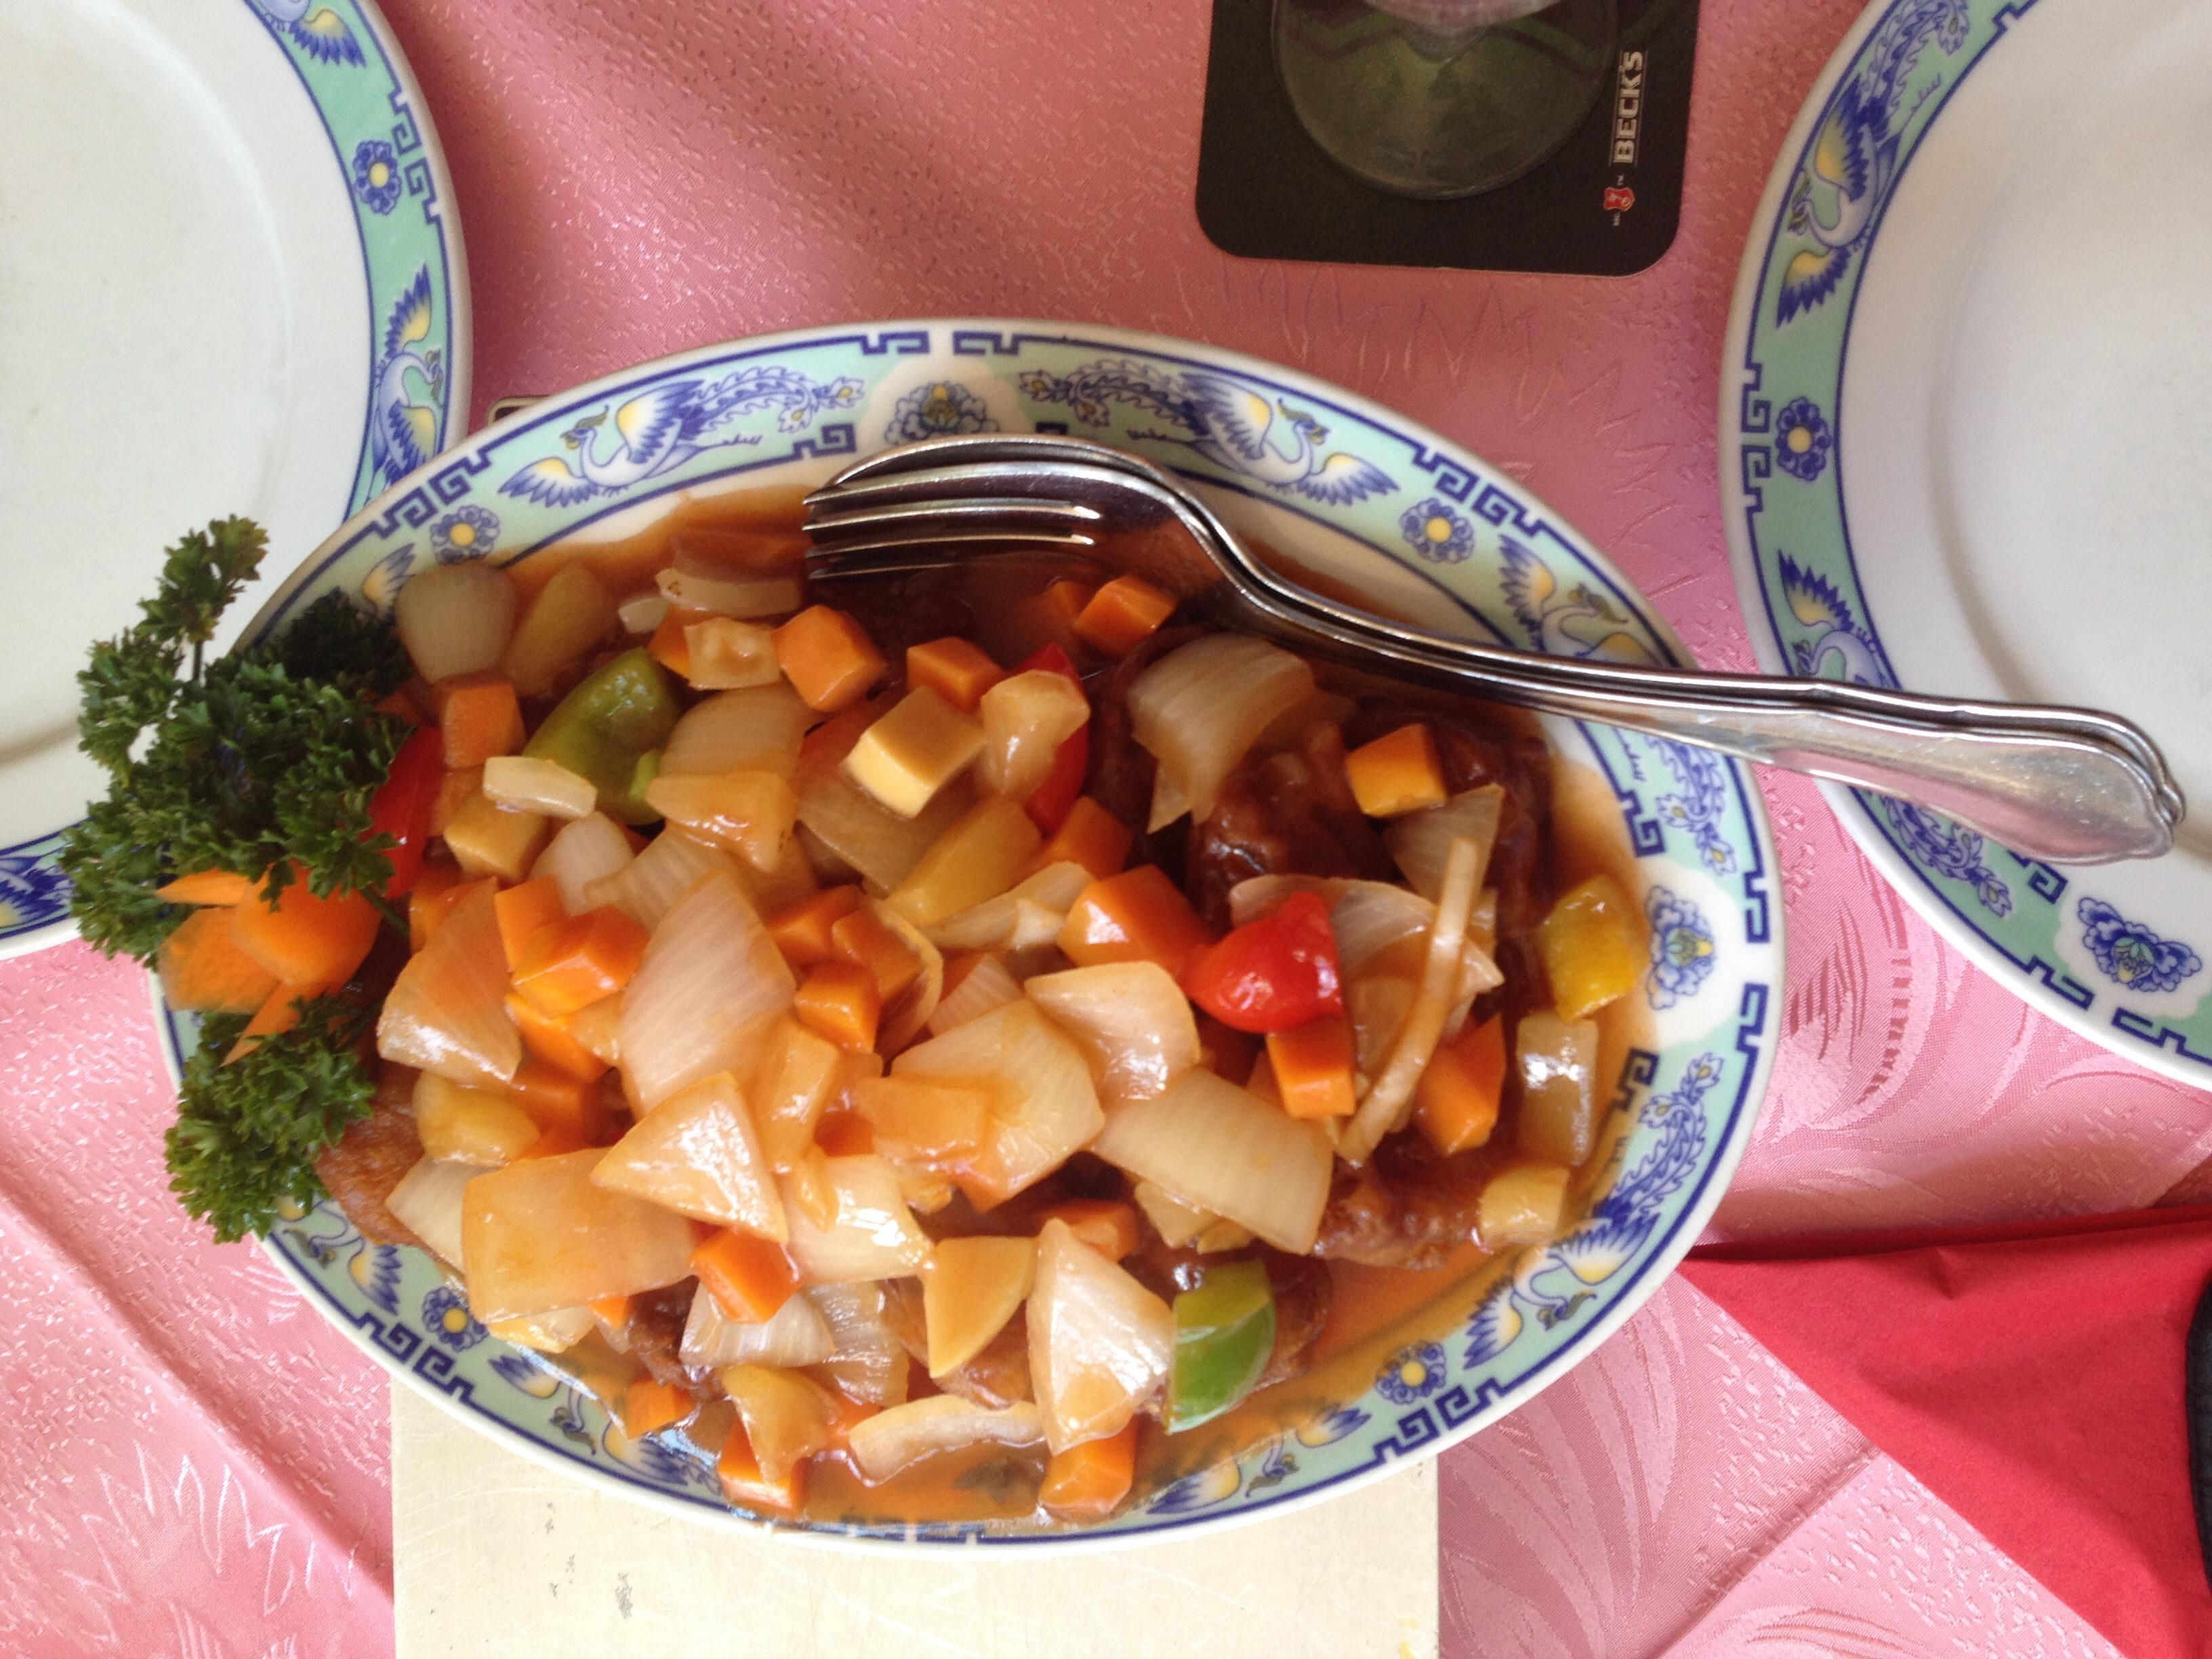 http://foodloader.net/BrollyLSSJ_2015-08-09_Sentosa_-_Schweinefleisch_gebacken_s_____sauer.jpg